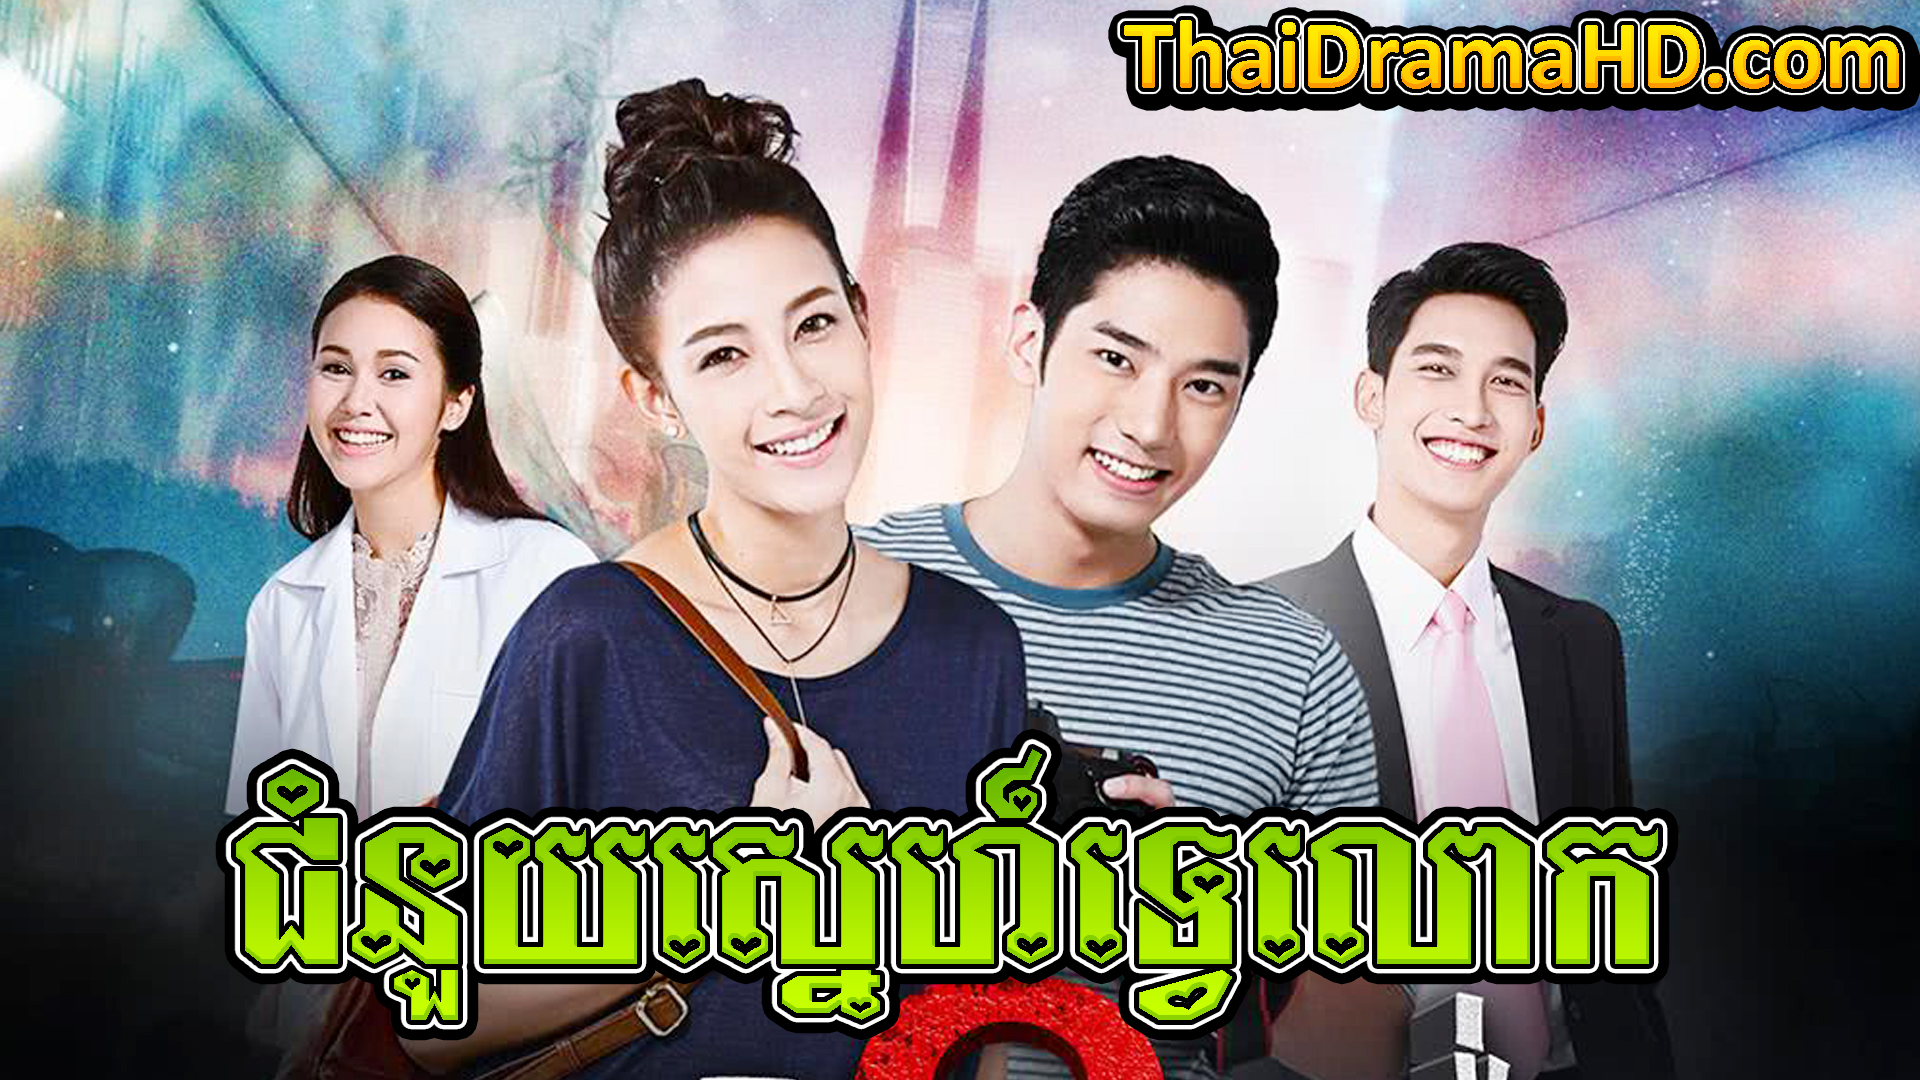 Chomnouy Sne Tve Lok | Thai Drama | Khmer Movie | Phumikhmer | movie-khmer | video4khmer | khmotions | kolabkhmer | khmer drama | ksdrama | cookingtips | roscheat | khmertimeskh | khmerkomsan | phumi7 | merlkon | film2us | movie2kh | sweetdrama | khmercitylove | khreplay | tvb cambodia drama | ckh7 | srokthai | phumimedia | phumi8 | khmer avenue | khmer search | Soyo | khmerfans